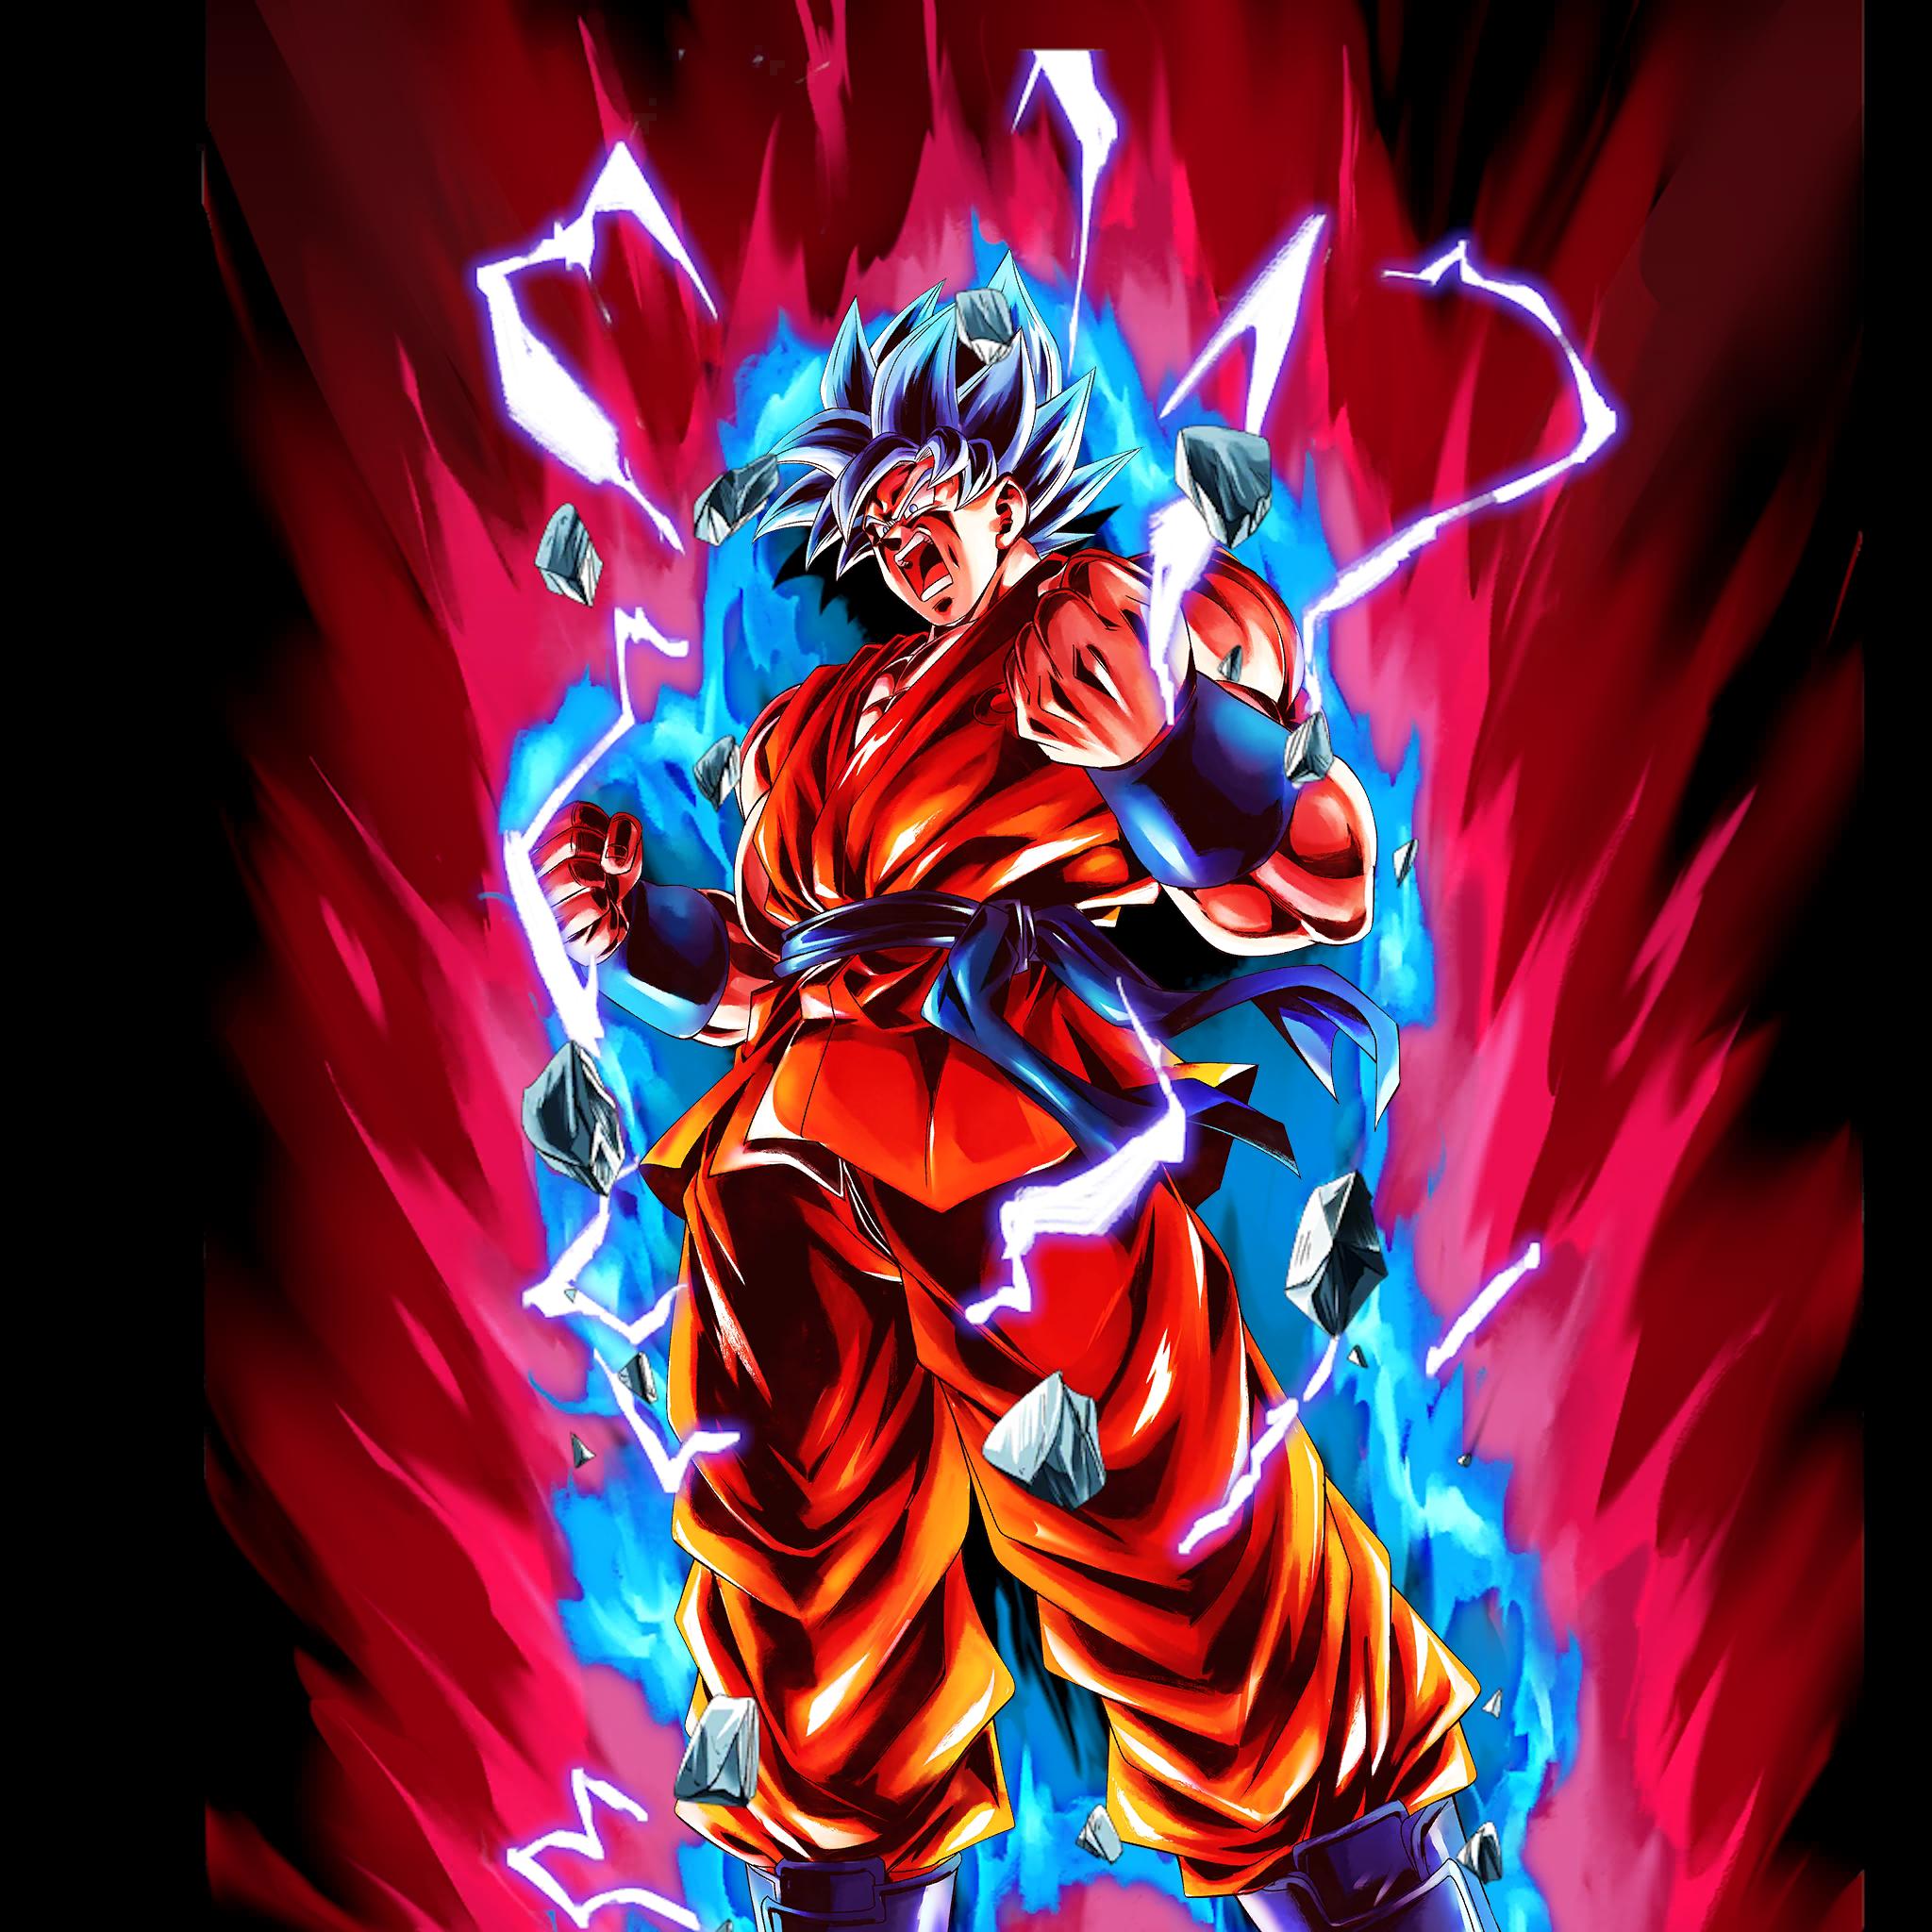 Goku Kaioken Wallpapers   Top Goku Kaioken Backgrounds 2048x2048